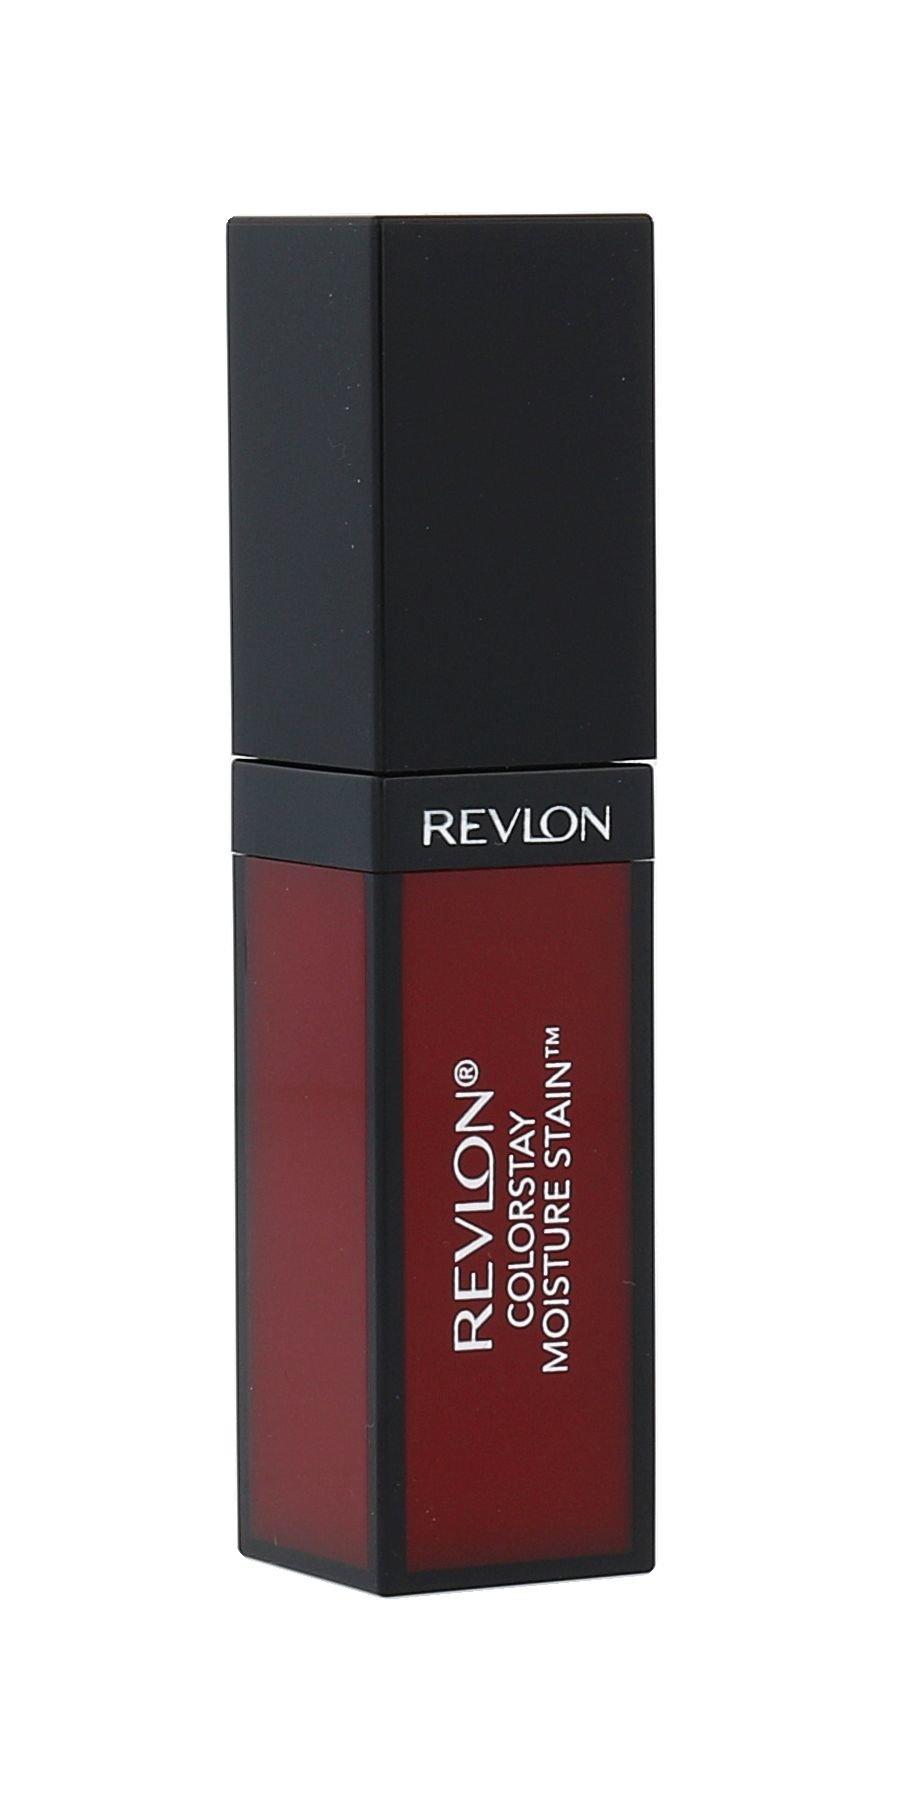 Revlon Colorstay Cosmetic 8ml 045 New York Scene